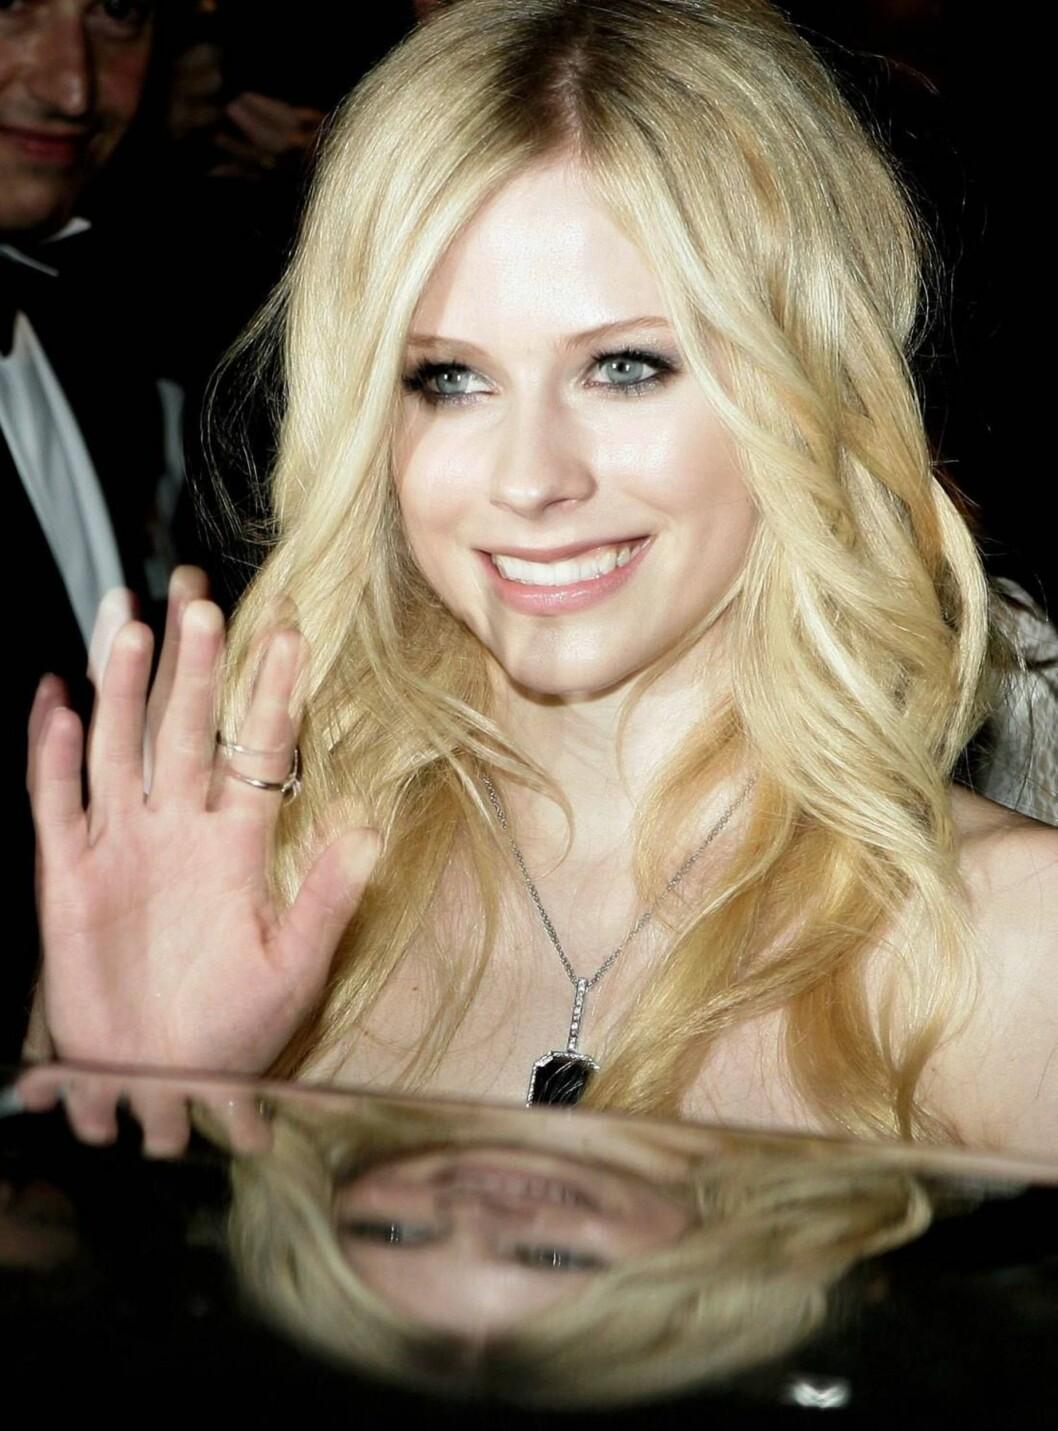 SAYONARA: Avril vinker farvel til livet som rockestjerne. Nå vil hun til filmen! Foto: All Over Press